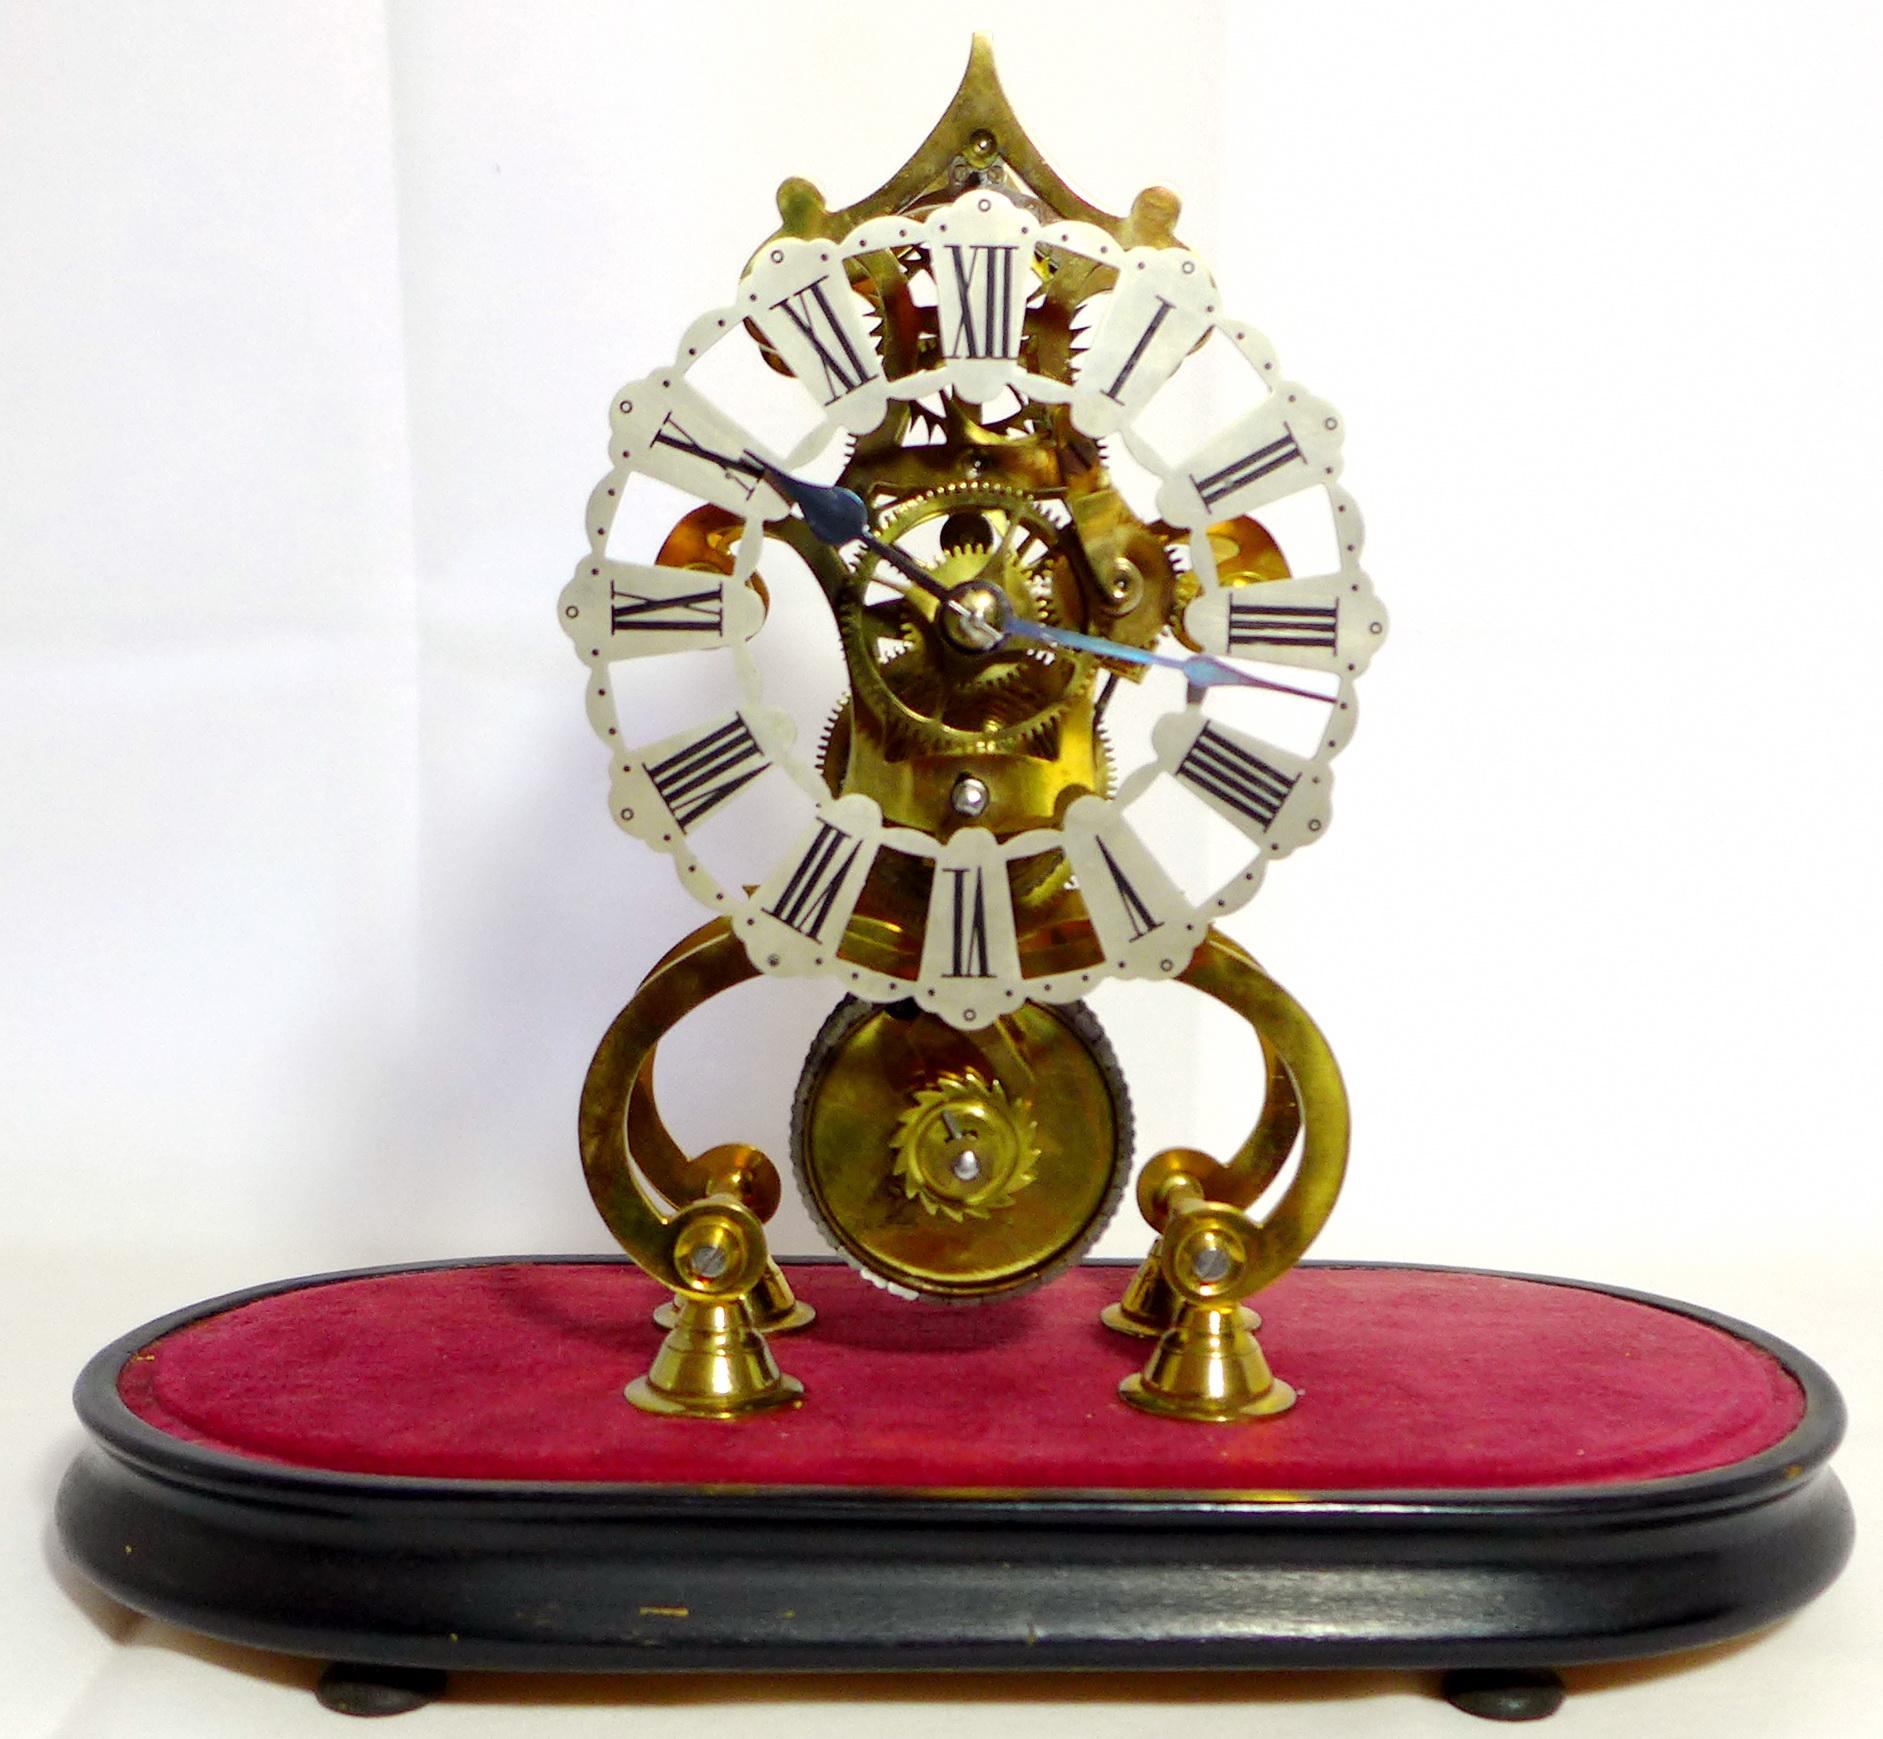 skelettierte tischuhr skeleton clock england um 1870 mit glasdom selten. Black Bedroom Furniture Sets. Home Design Ideas